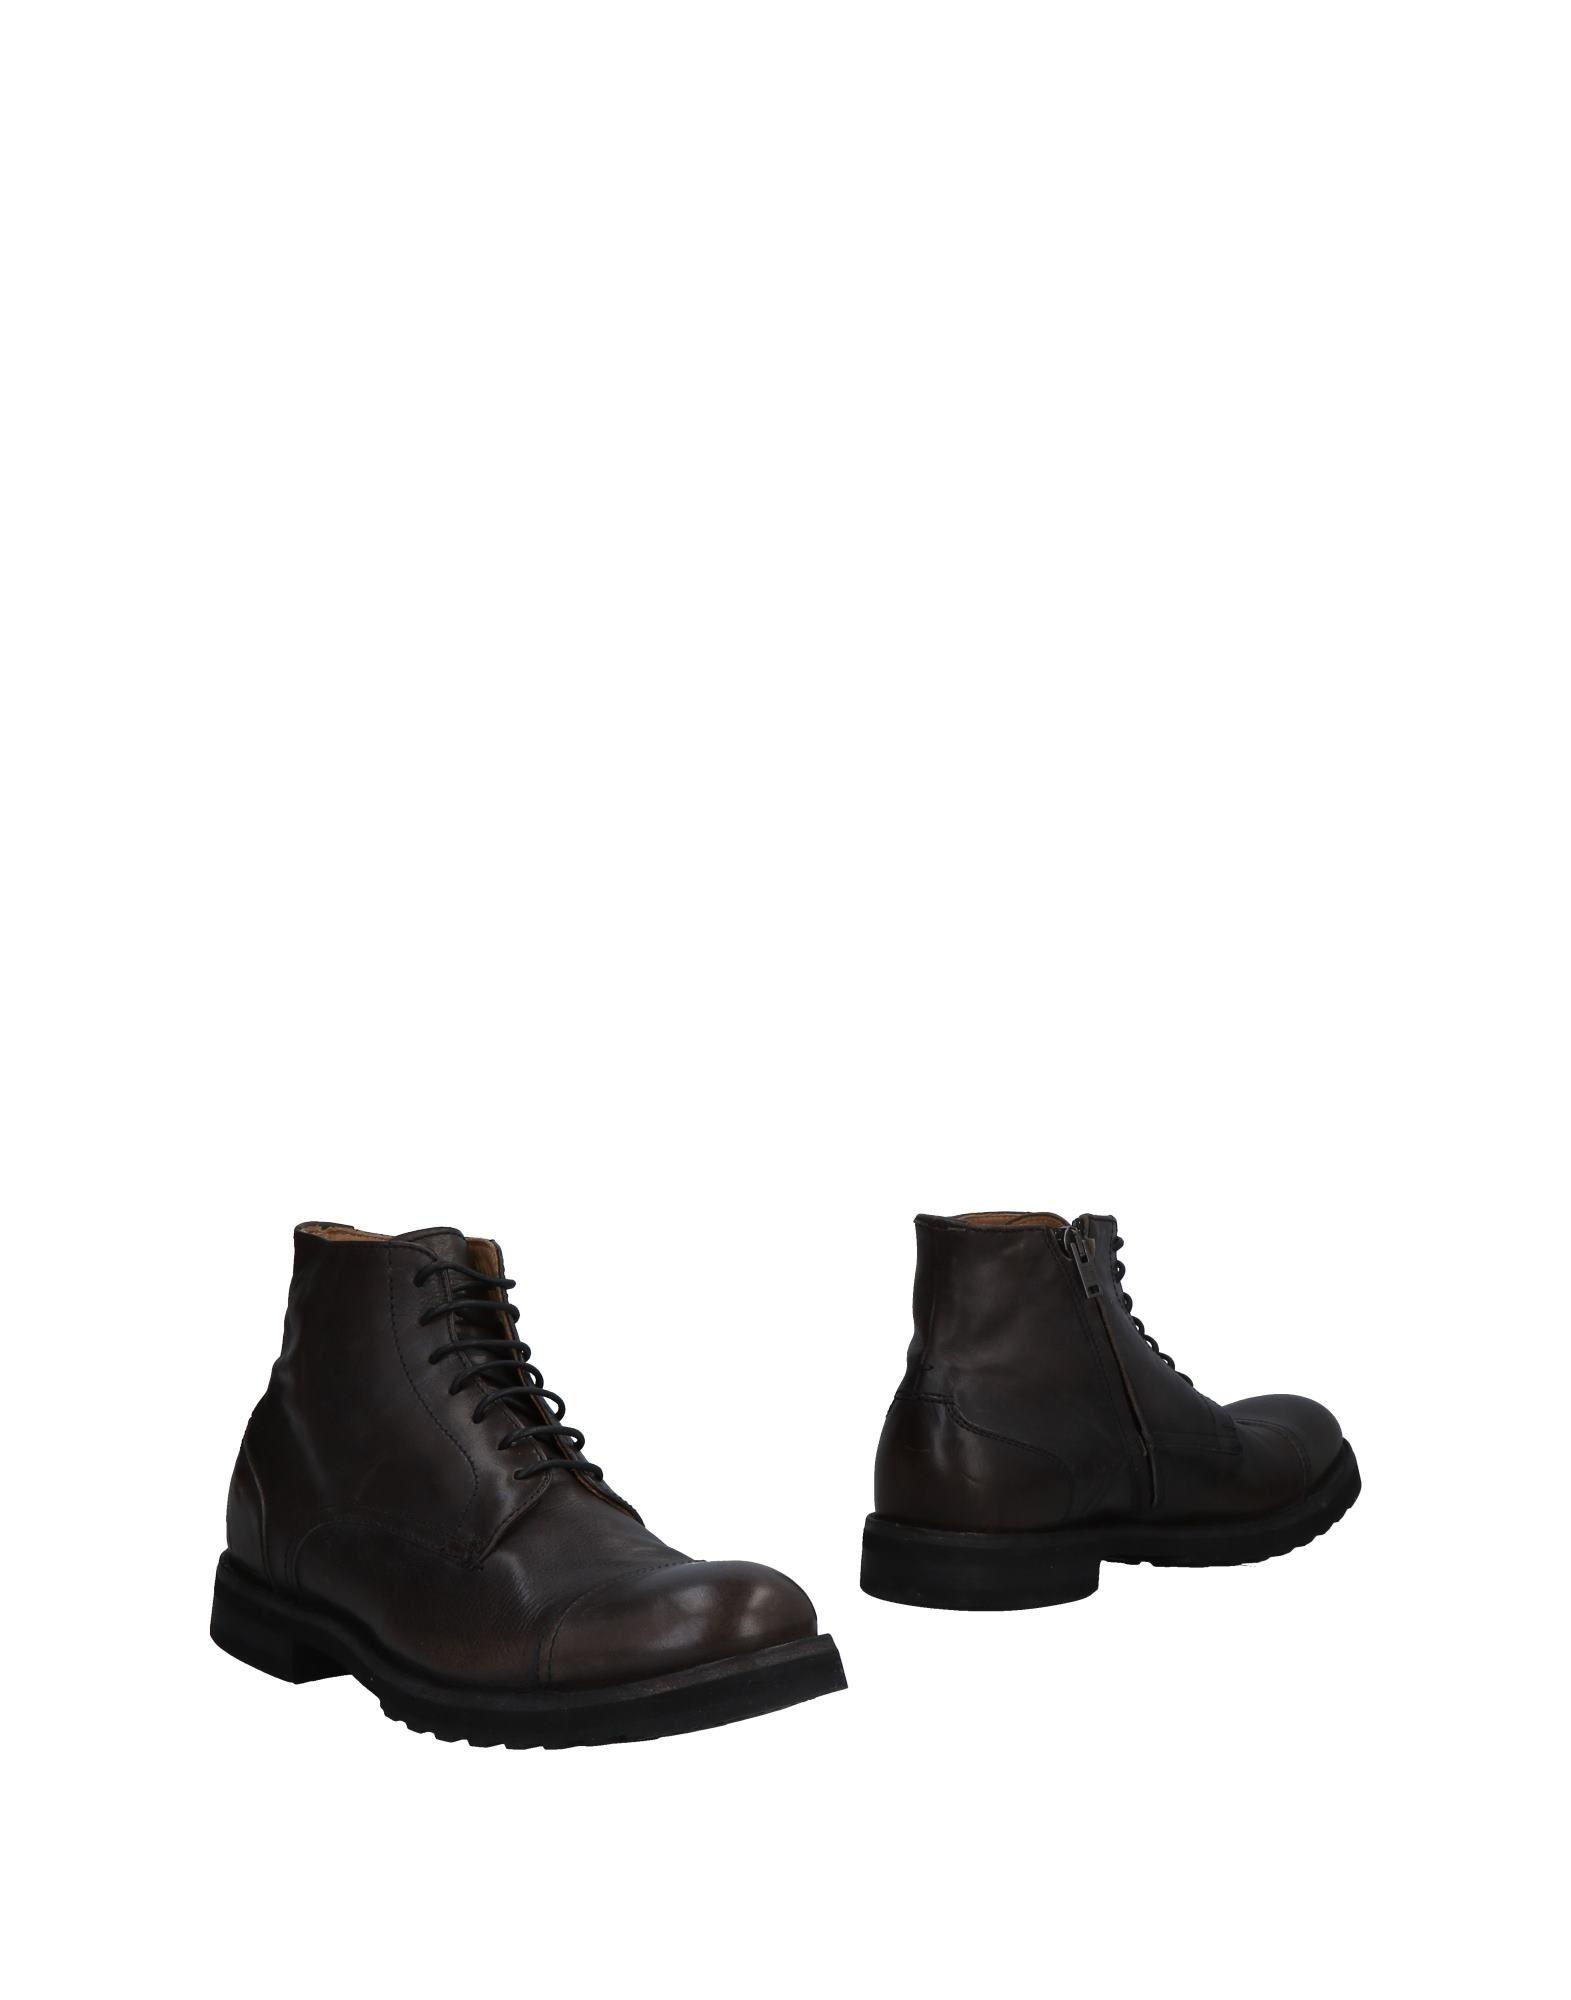 Pantanetti Stiefelette Herren  11492921NJ 11492921NJ 11492921NJ Heiße Schuhe 2e5341